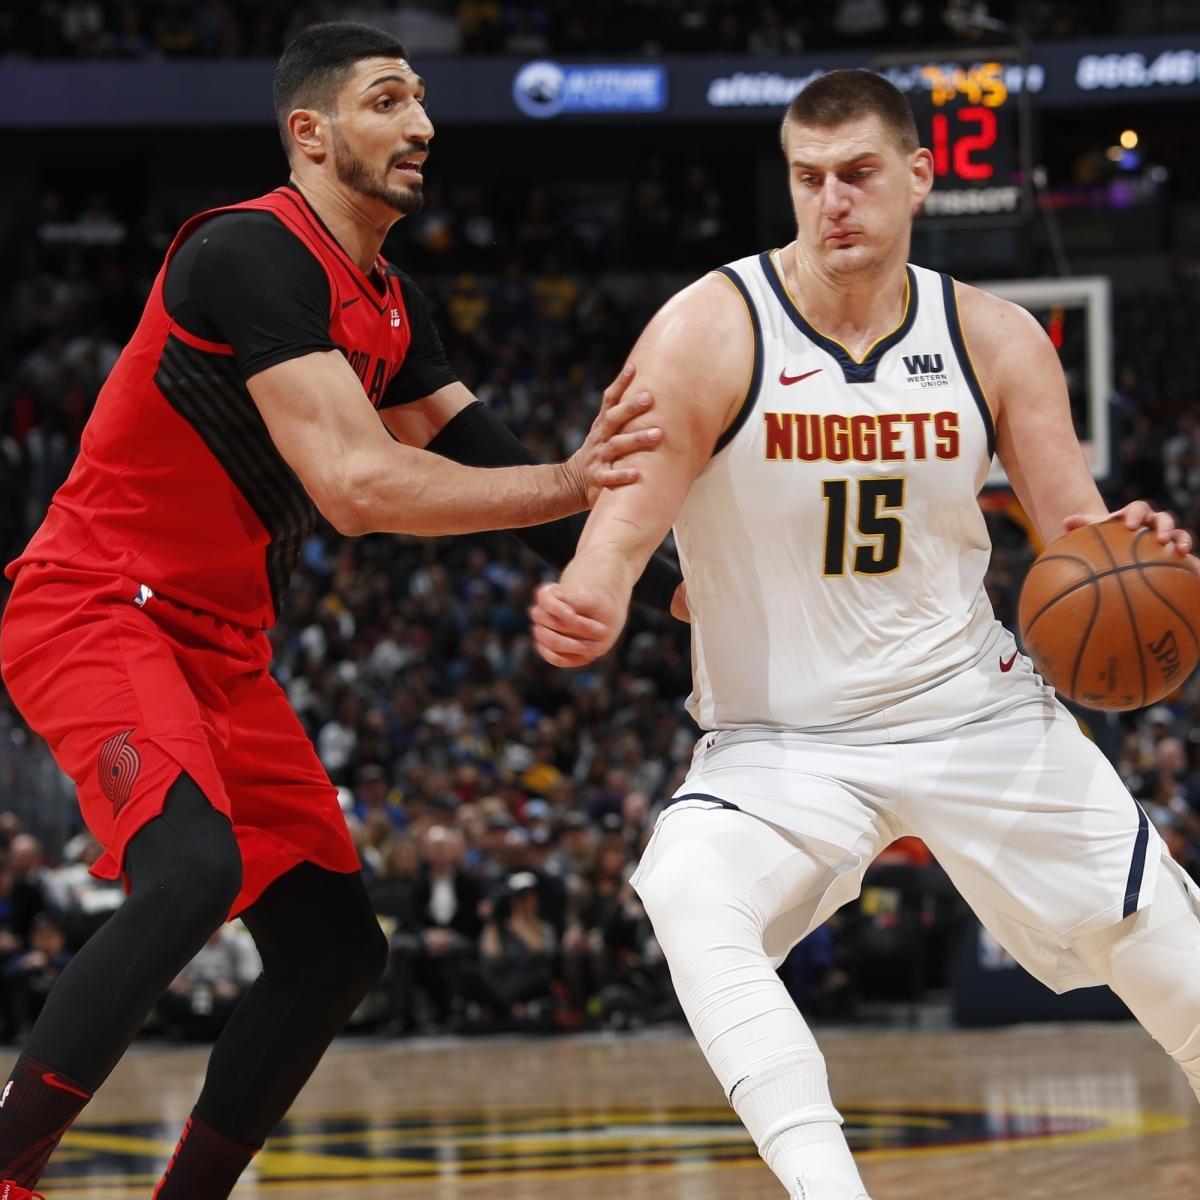 Nuggets Playoff Tickets 2019: Nikola Jokic: Trail Blazers 'Didn't Play That Good' In